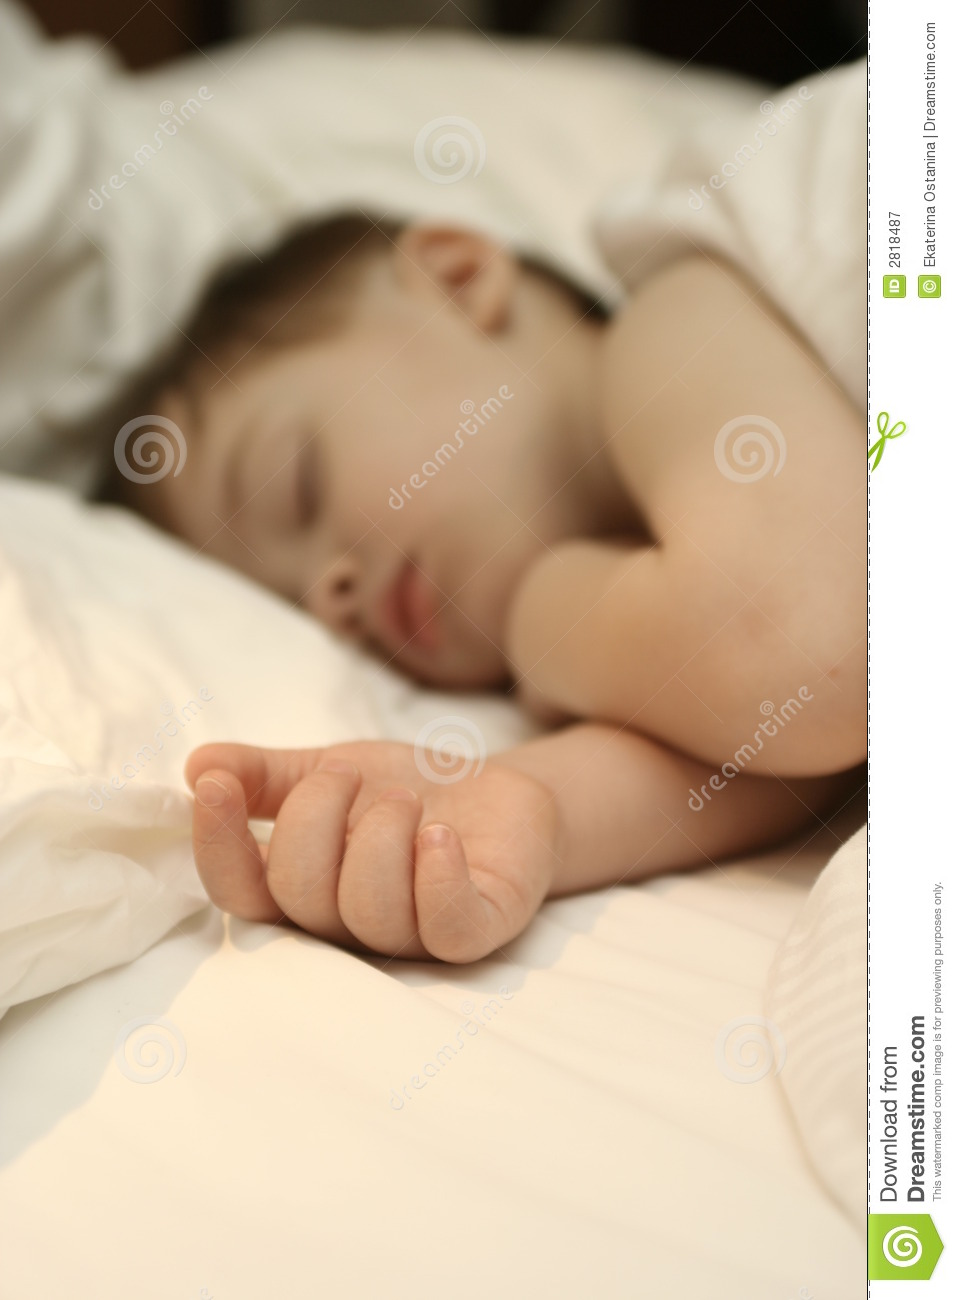 sleeping-child-lays-b-2818487